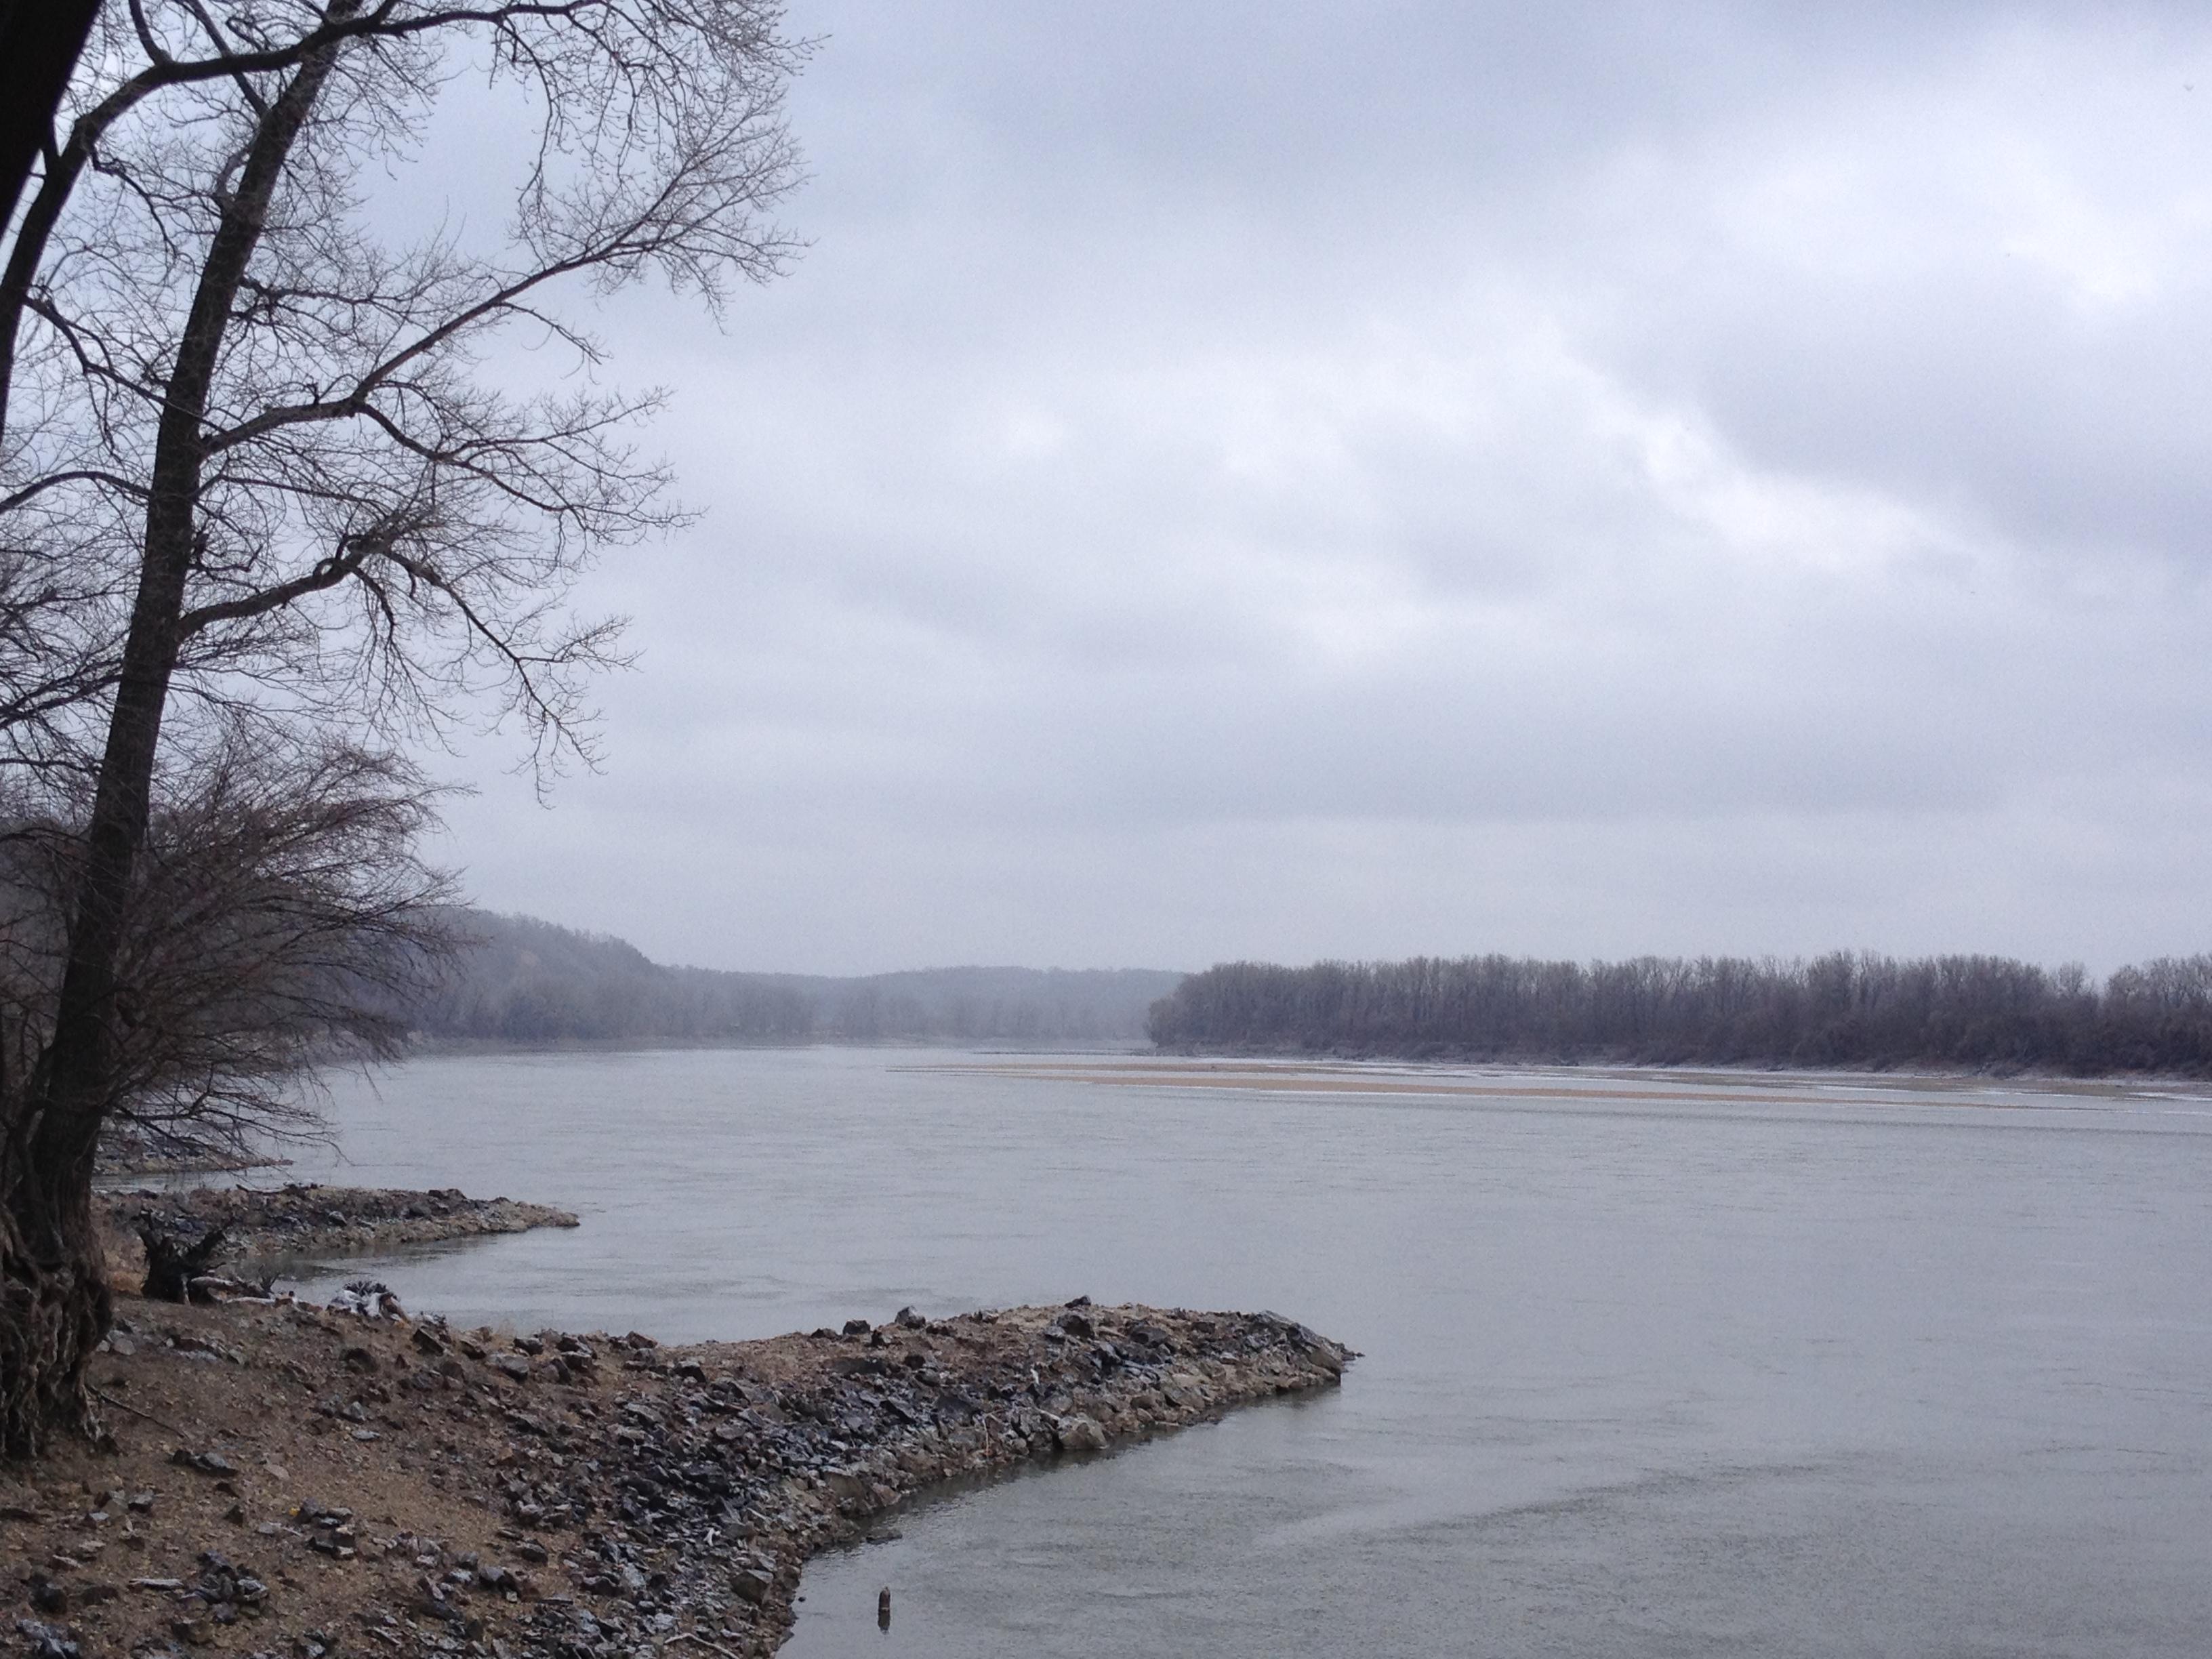 The Missouri River at Cooper's Landing, MO